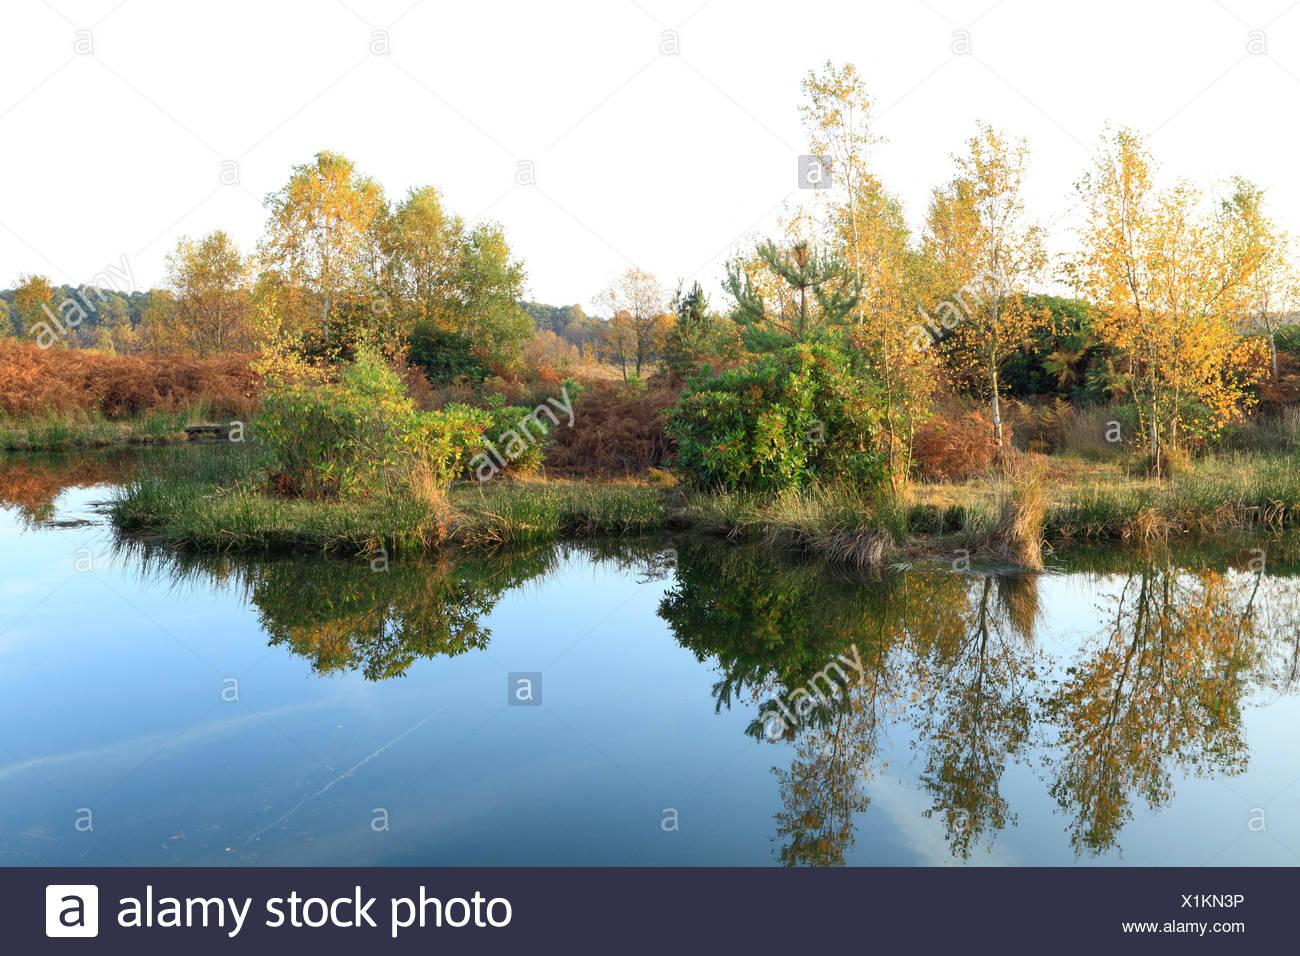 Dersingham Bog National Nature Reserve, designated a Site of Special Scientific Interest, mire, heath and woodland, SSI, Autumn - Stock Image